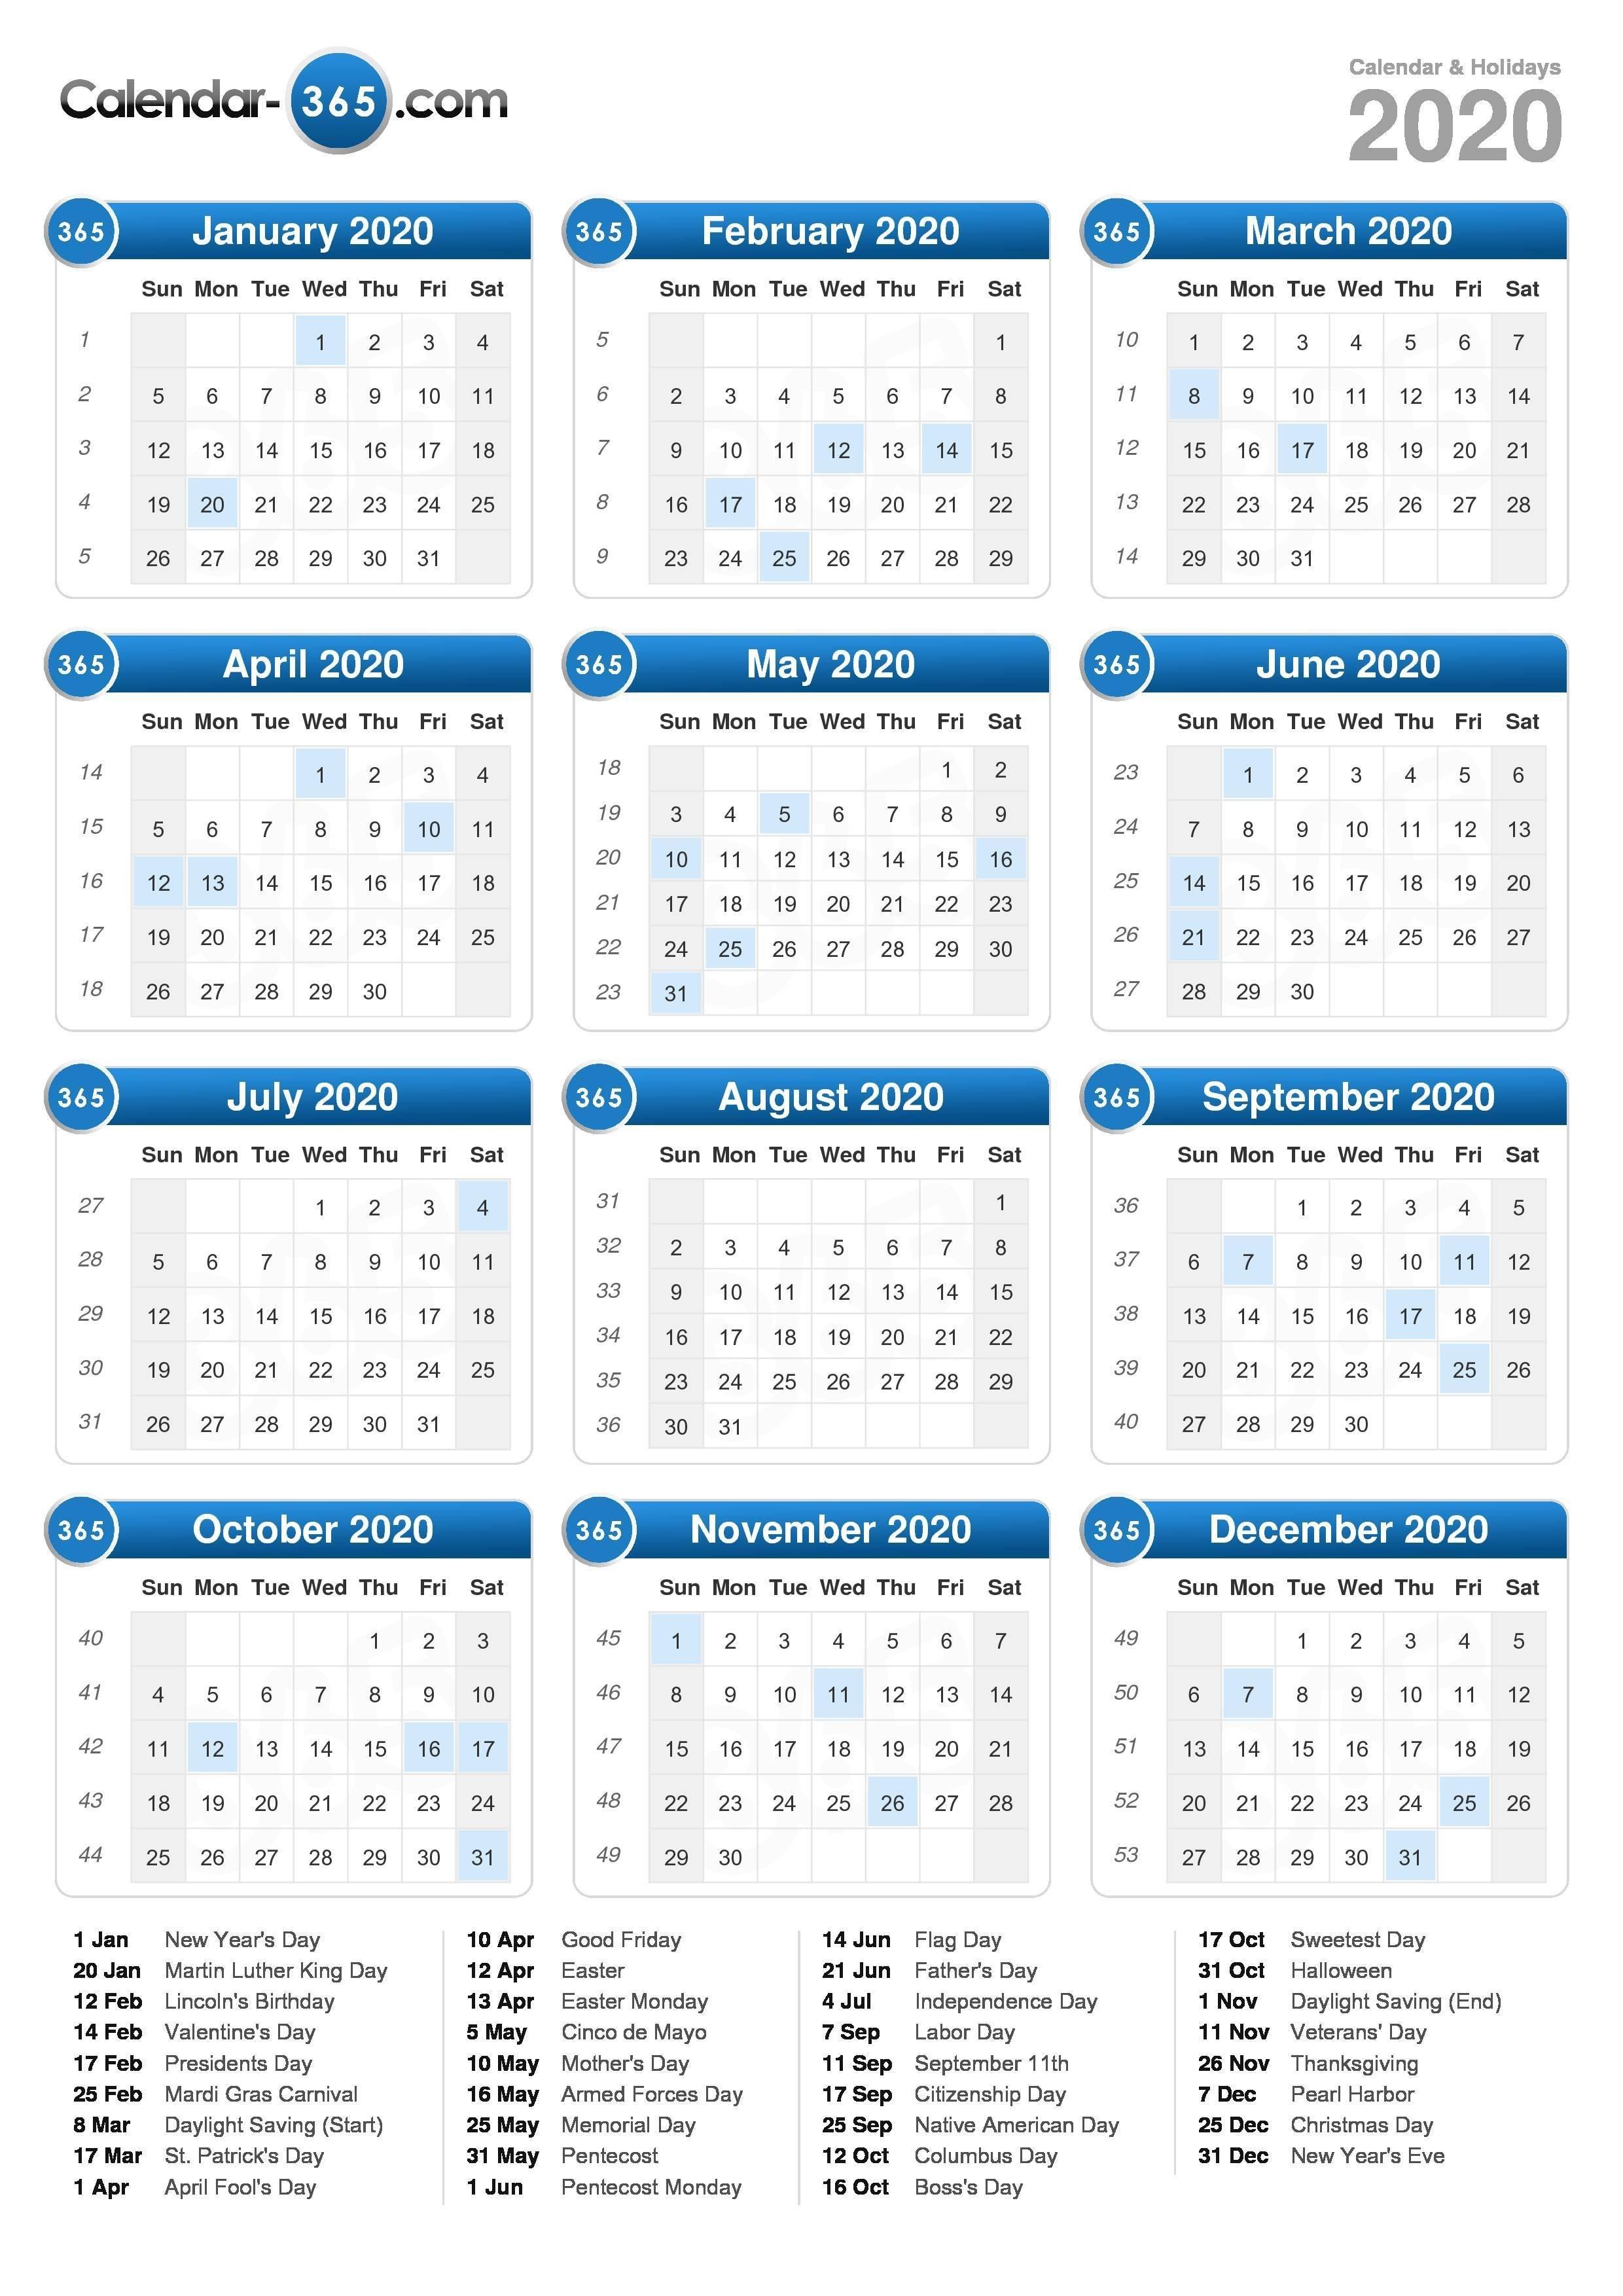 2020 Calendar-2020 Calendar With Holidays